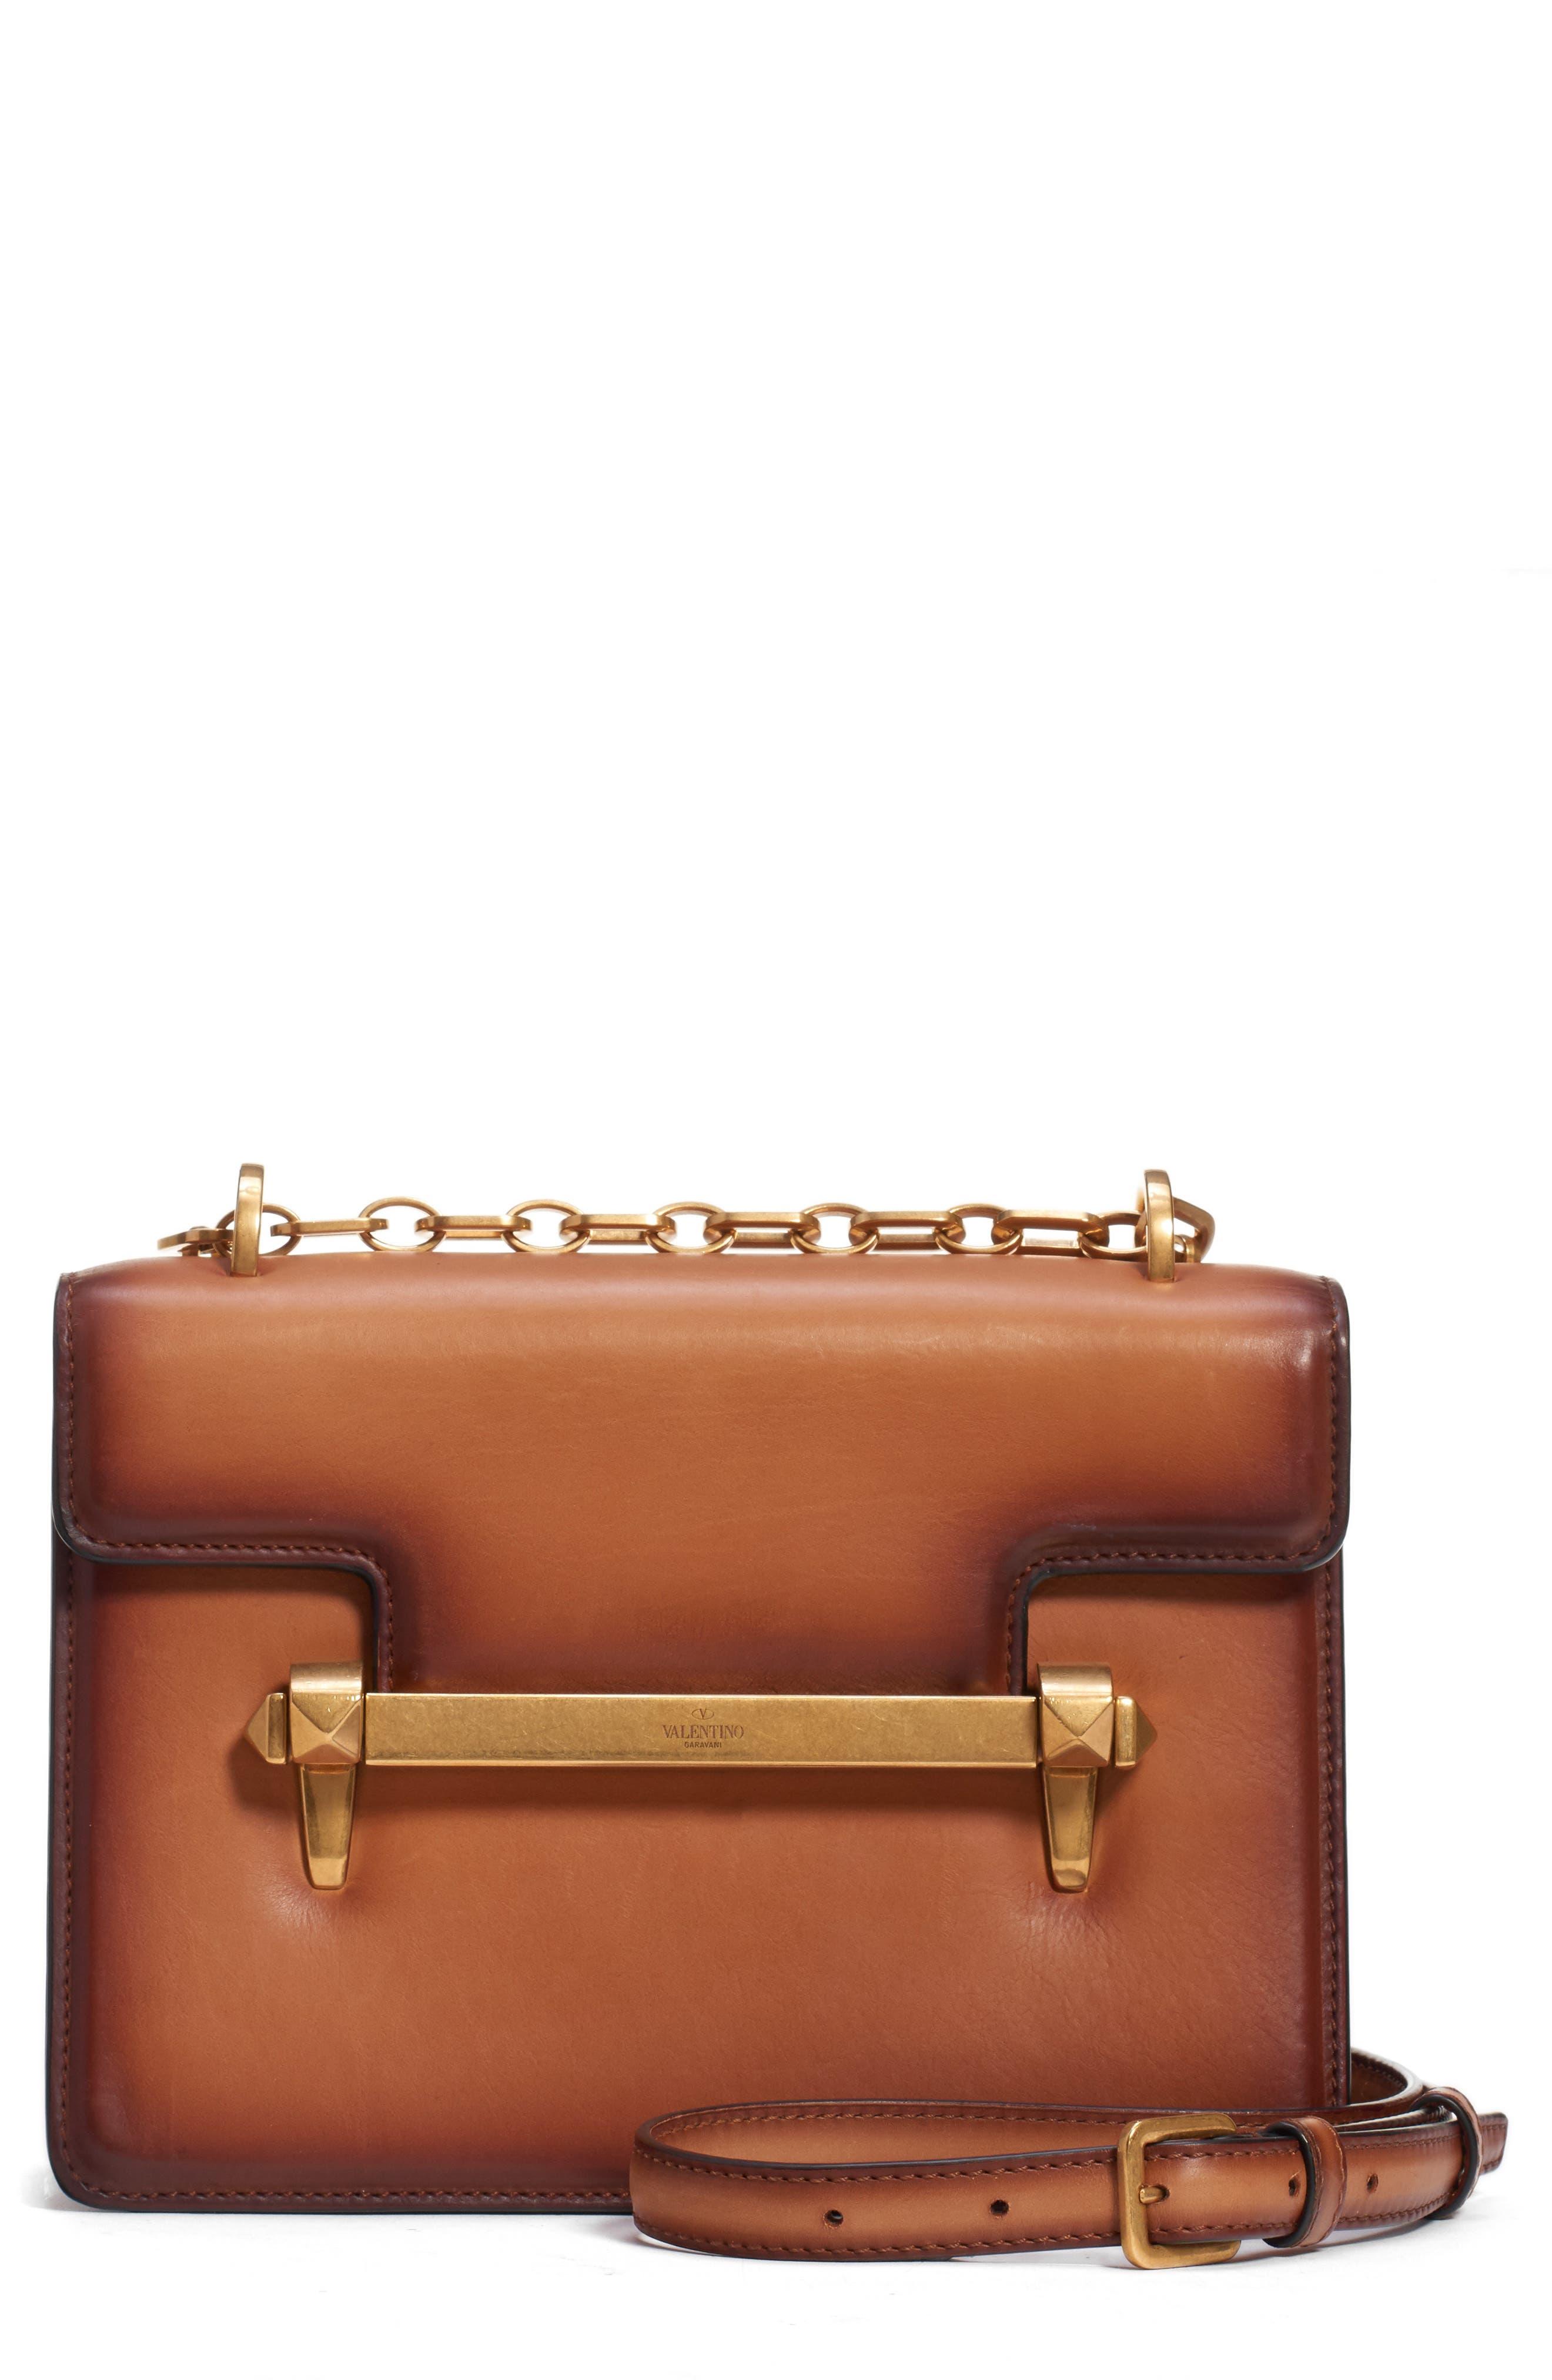 VALENTINO GARAVANI Small Uptown Leather Shoulder Bag, Main, color, BRIGHT COGNAC